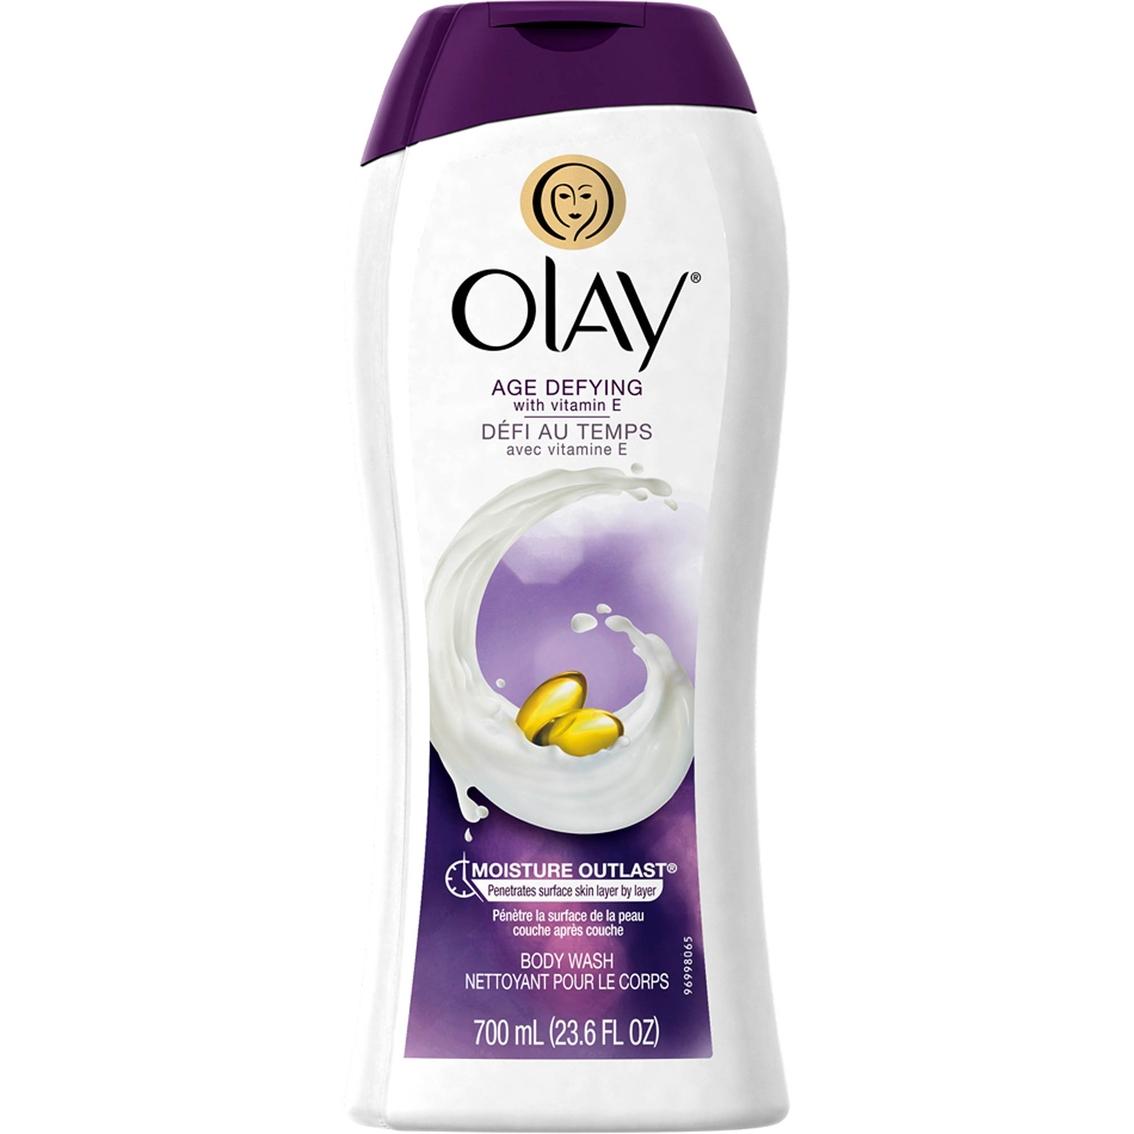 Olay Age Defying Body Wash With Vitamin E Hair Care Moisturising Lotion